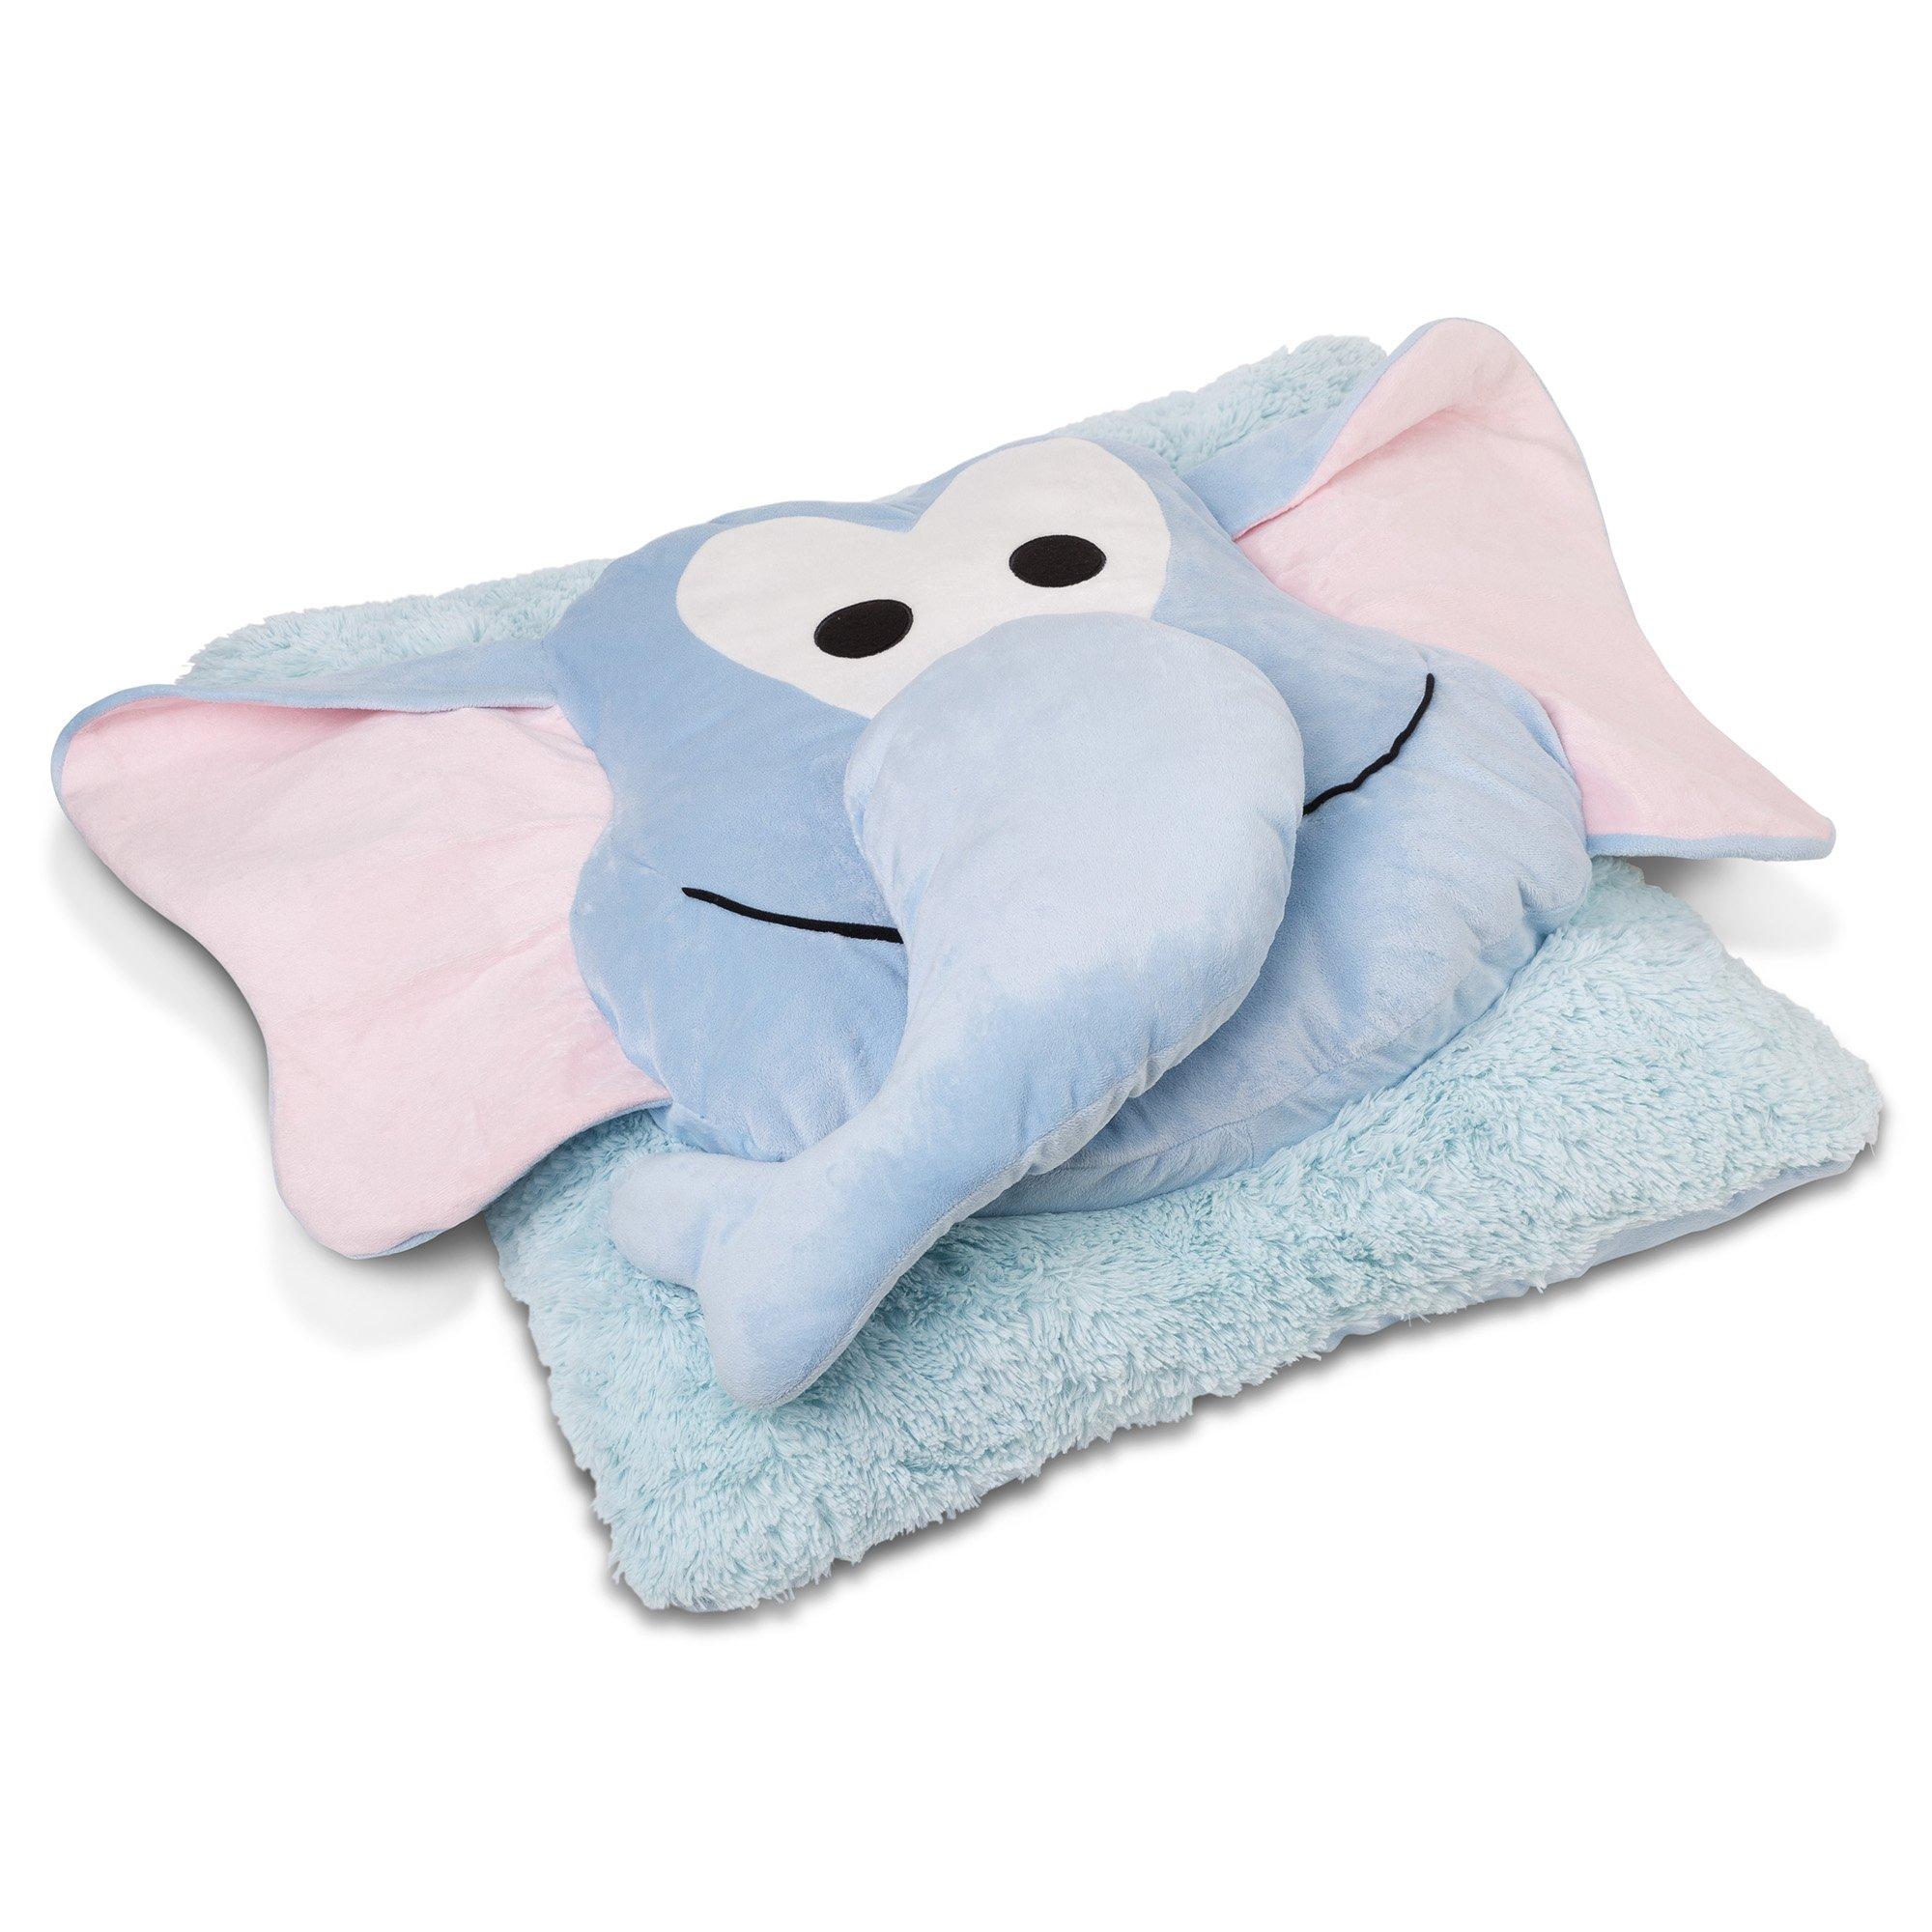 Safdie & Co. Elephant Fun Plush Oversized Floor Pillow